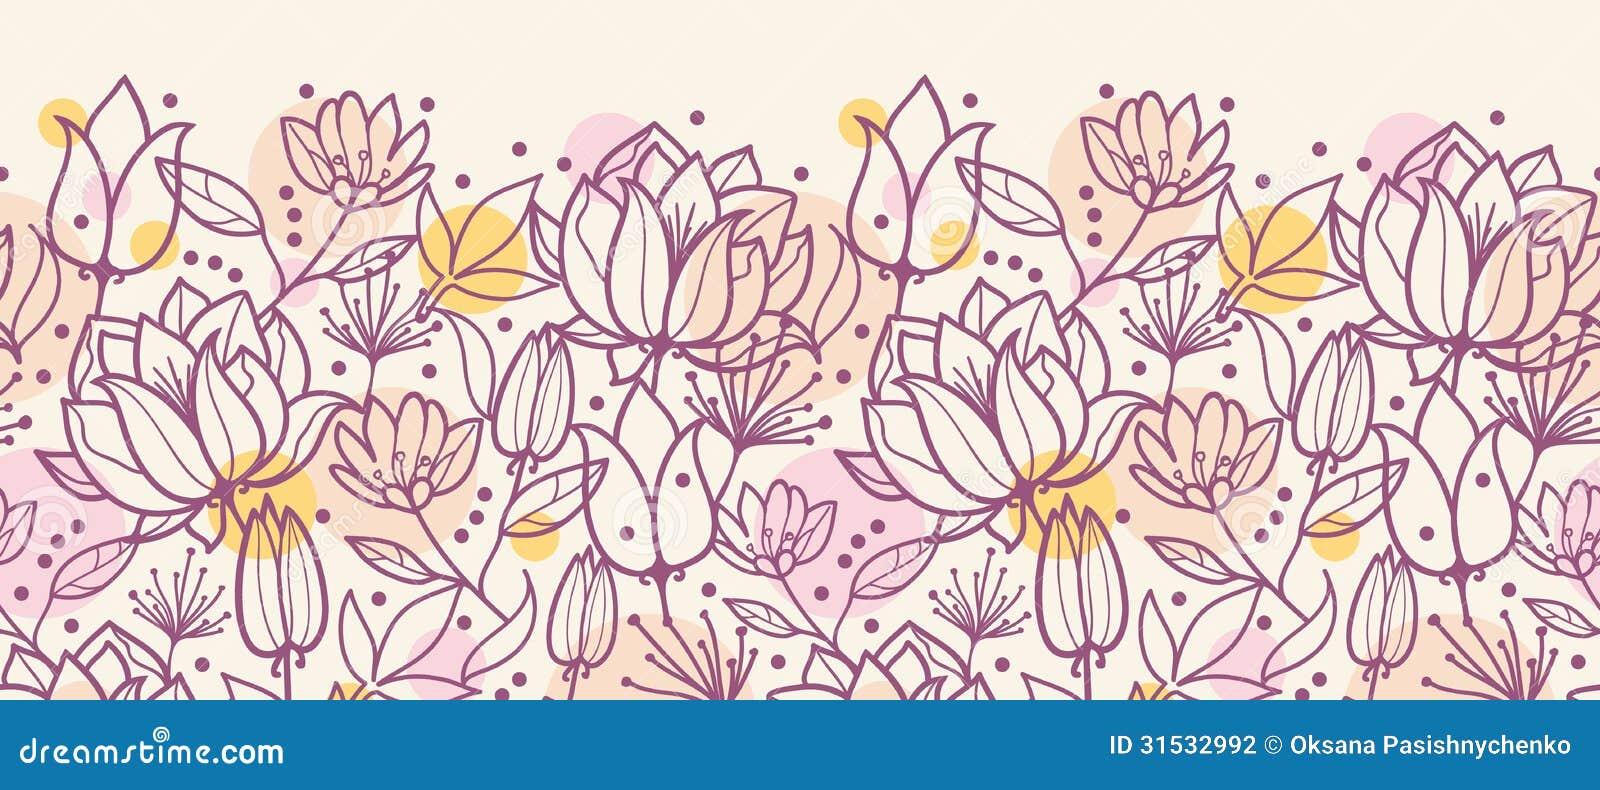 Purple Line Art Flowers Horizontal Seamless Stock Photography Image